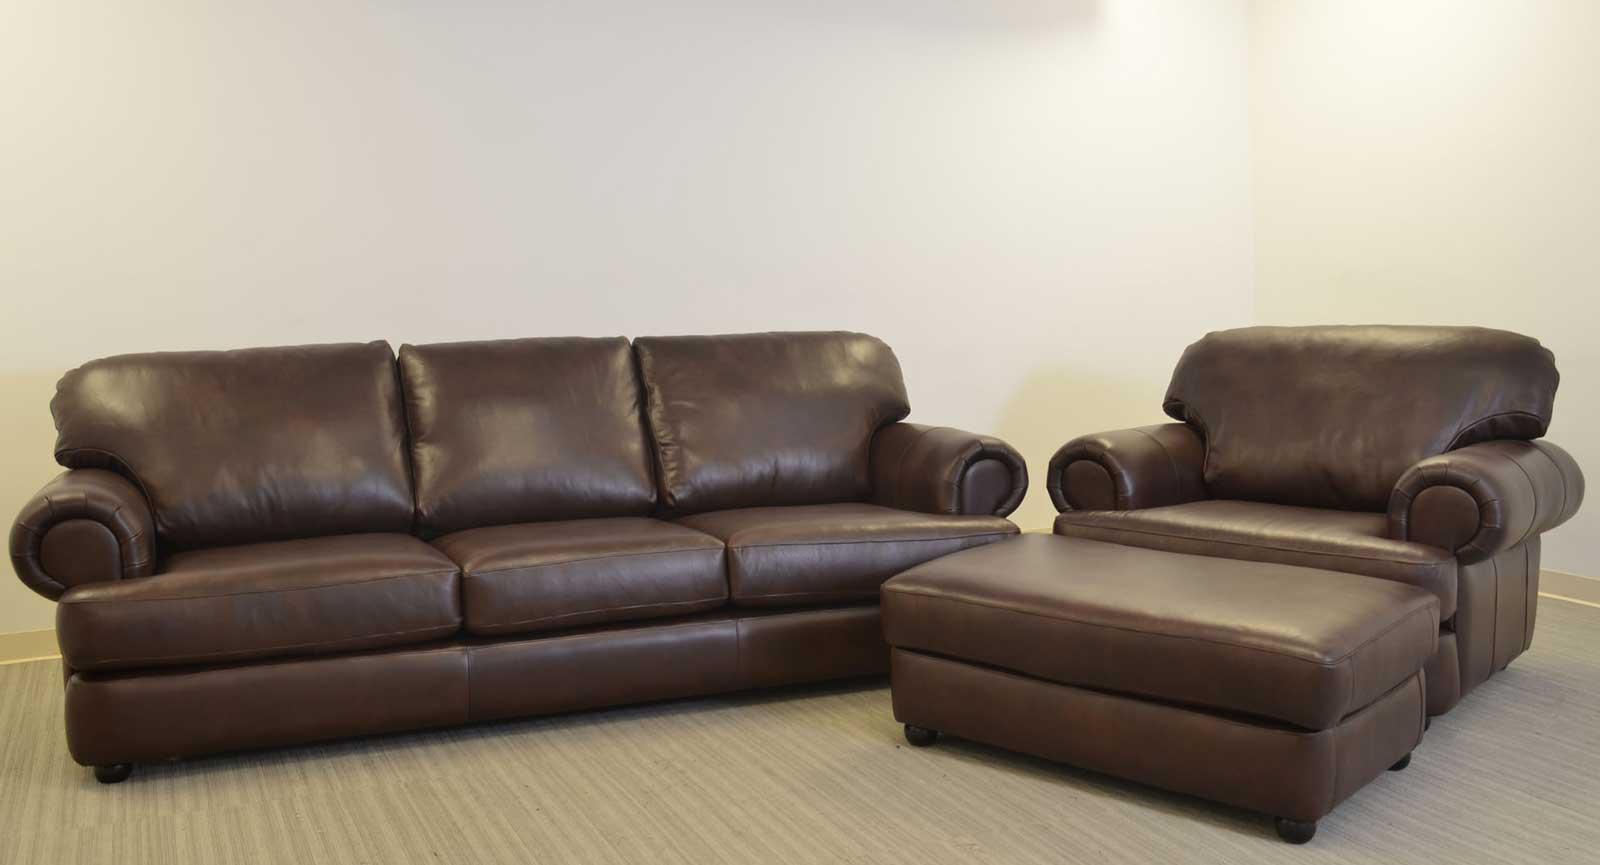 Three Seat Sofa Chair And Half Ottoman